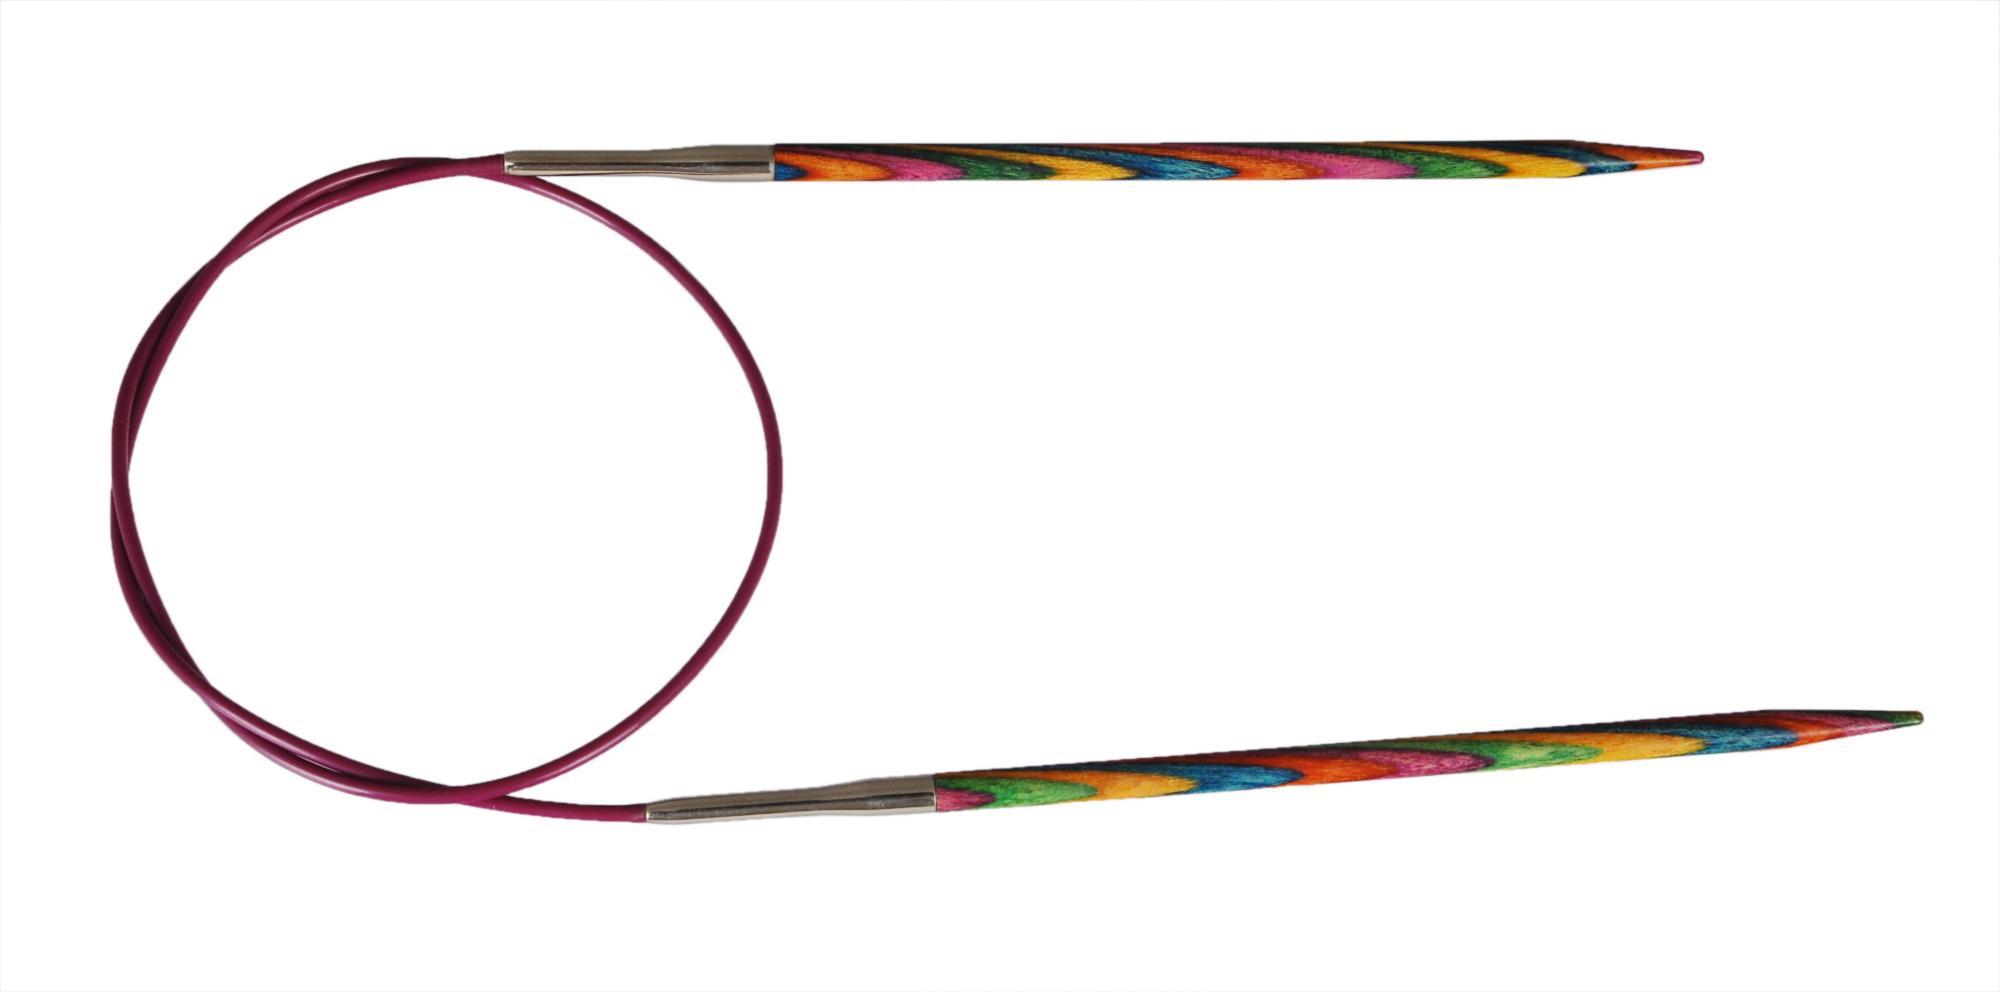 Спицы круговые 150 cм Symfonie Wood KnitPro, 21391, 10.00 мм.